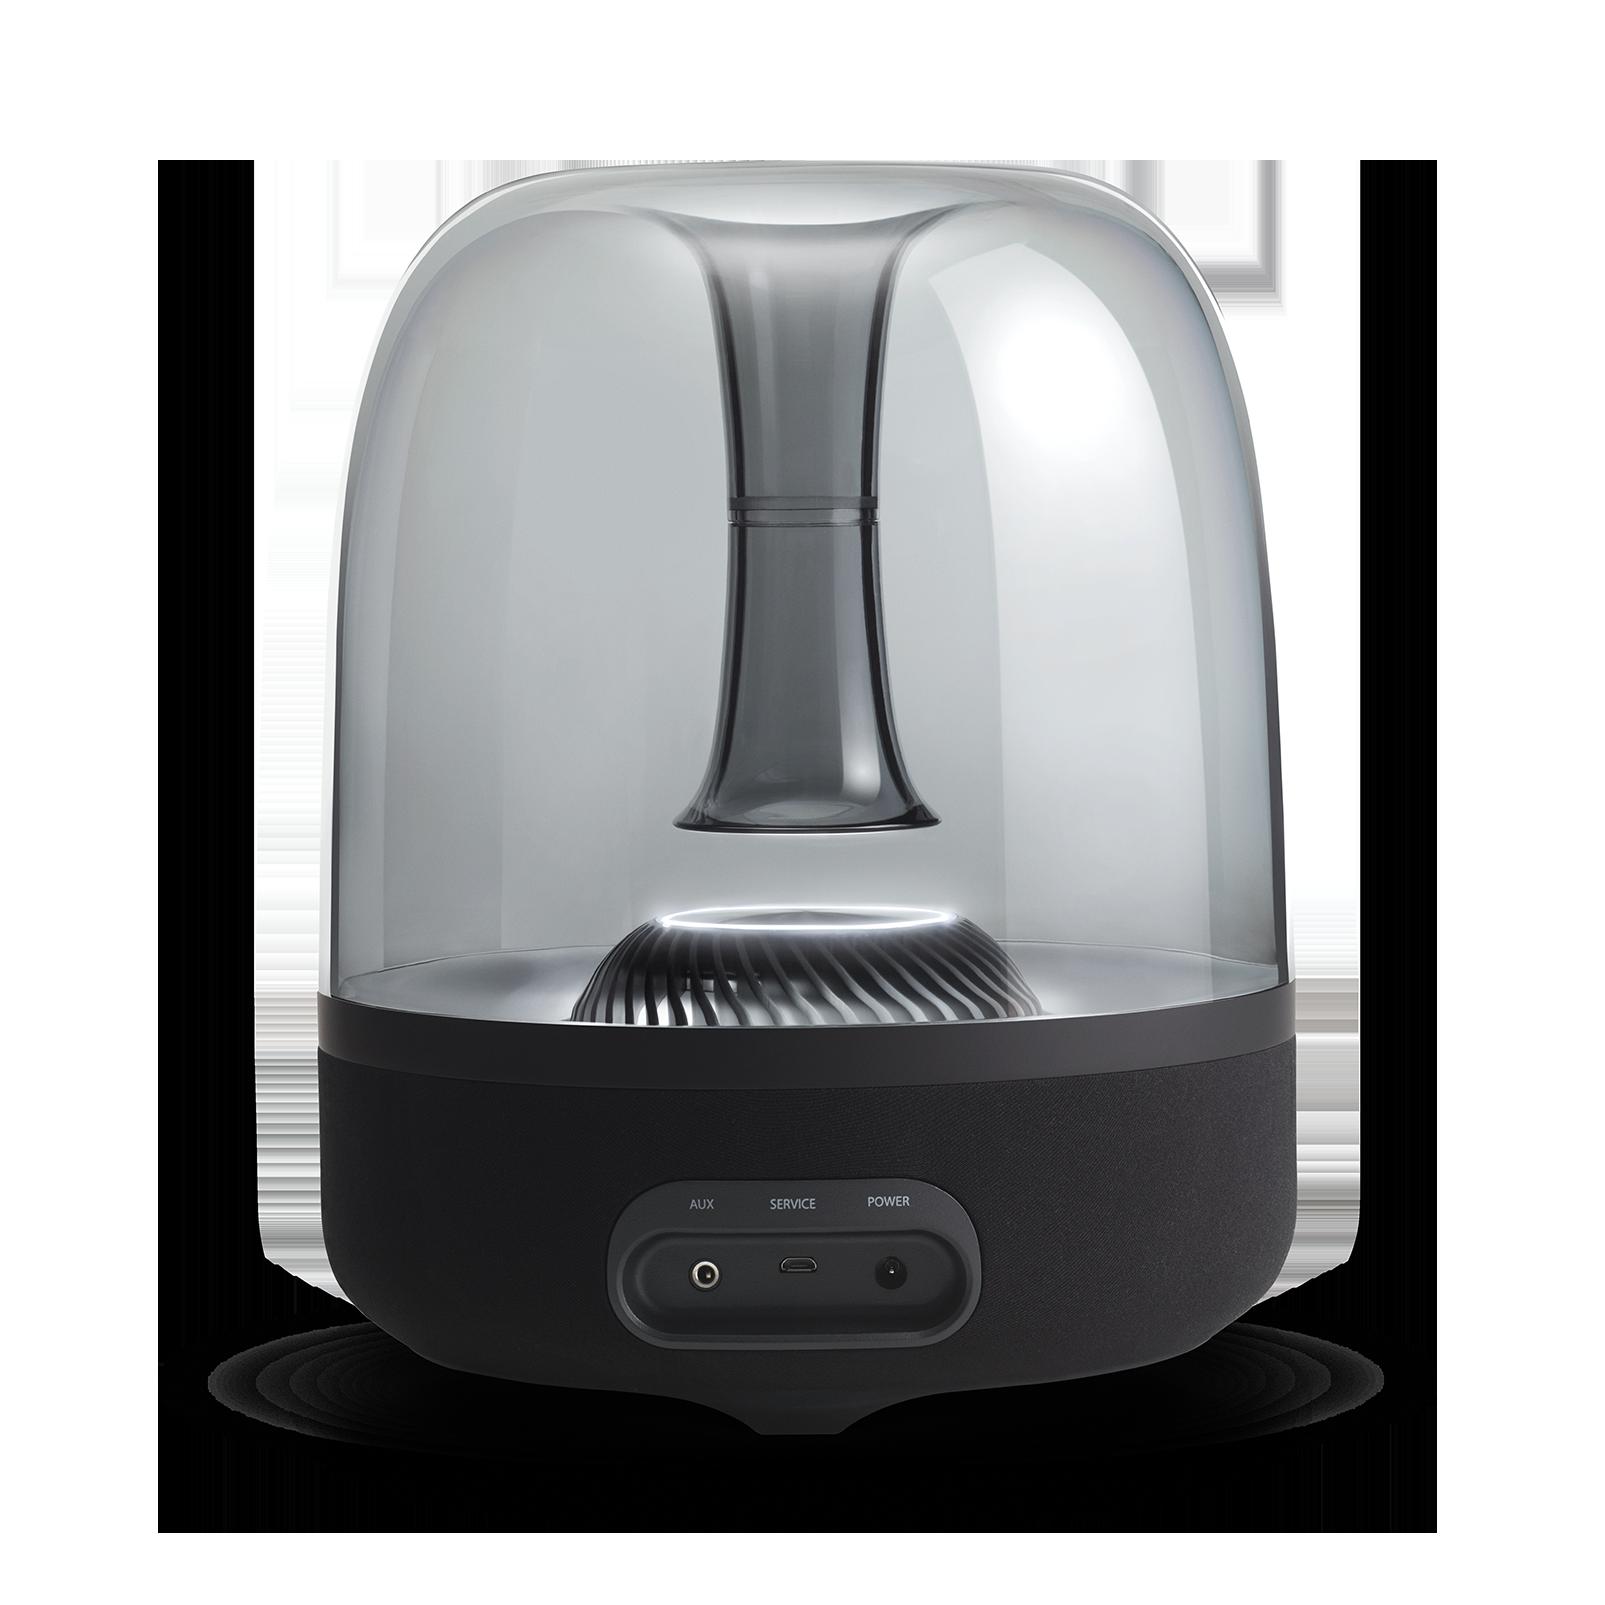 AURA STUDIO 2 - Black - Wireless speaker with ambient lighting - Back